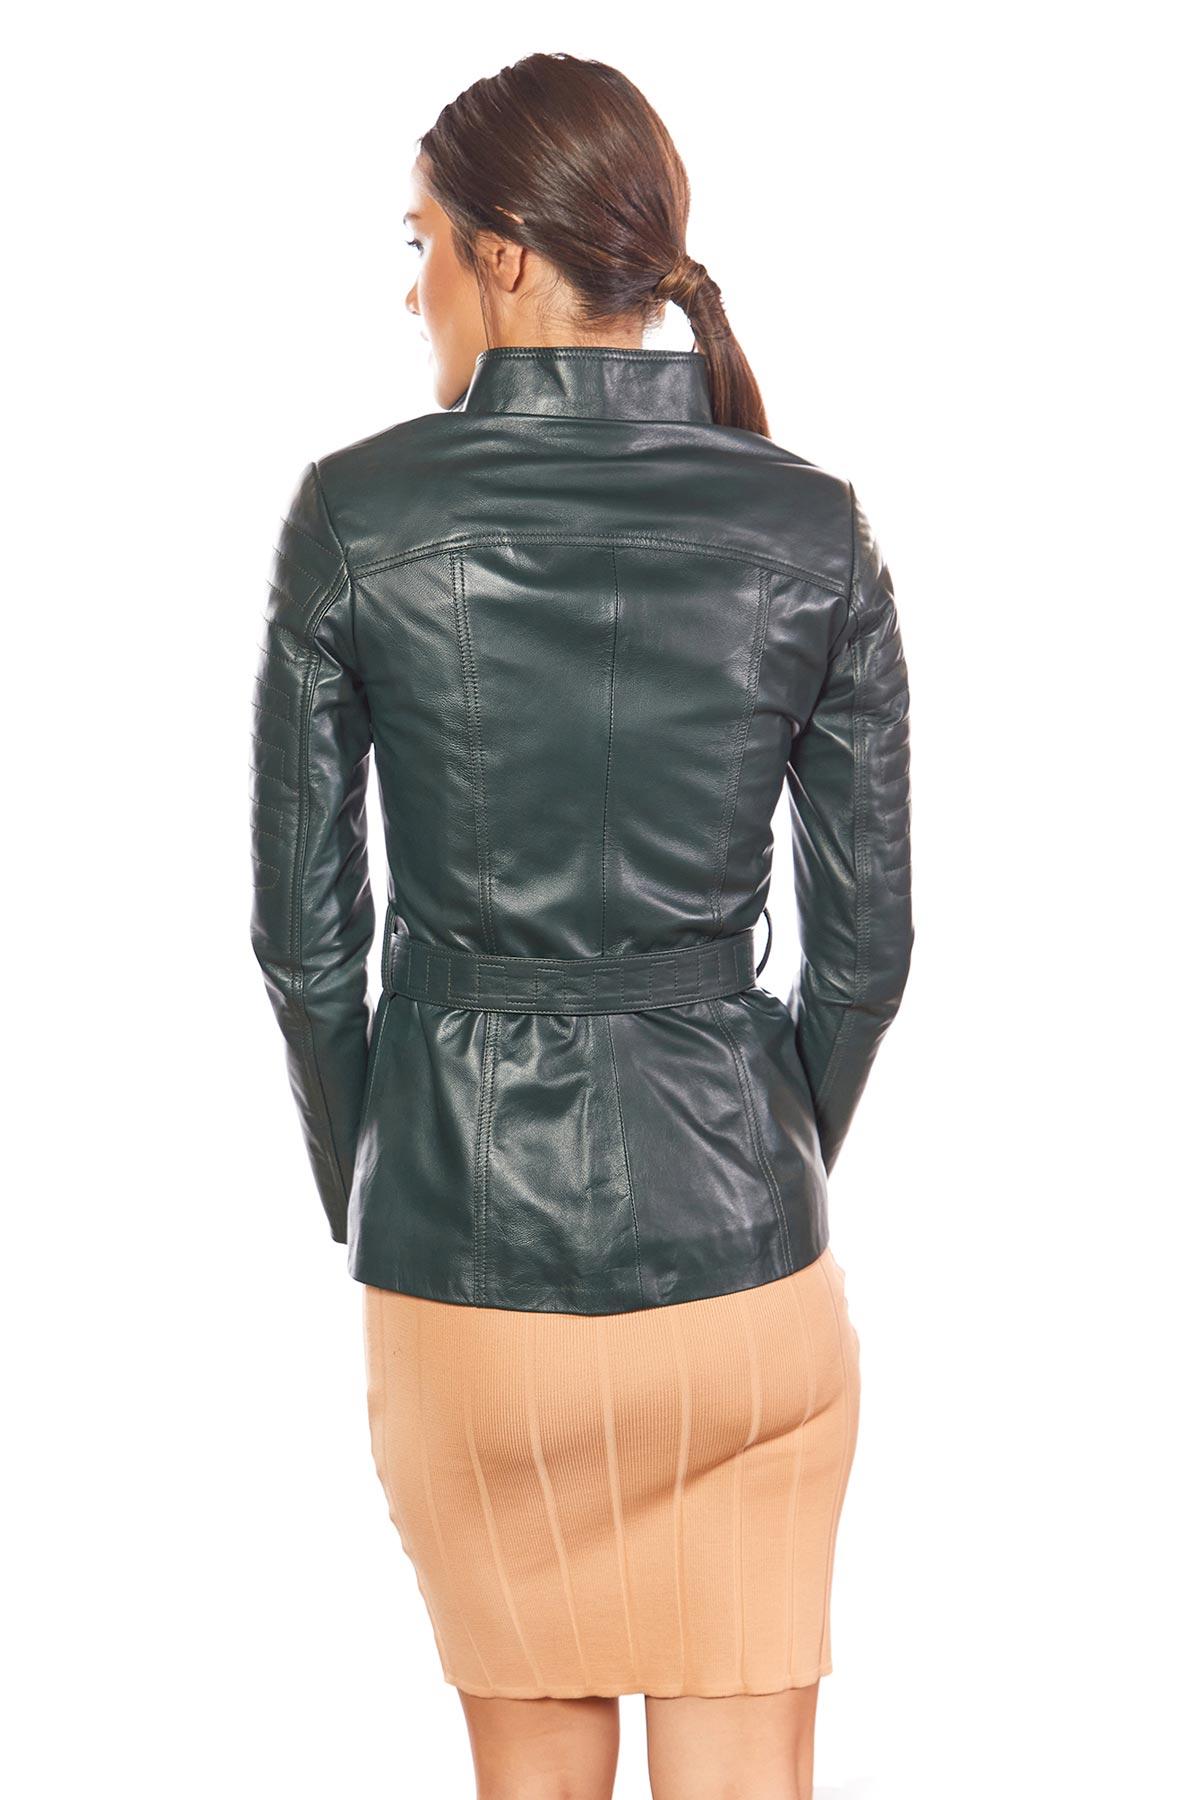 xl womens leather jacket